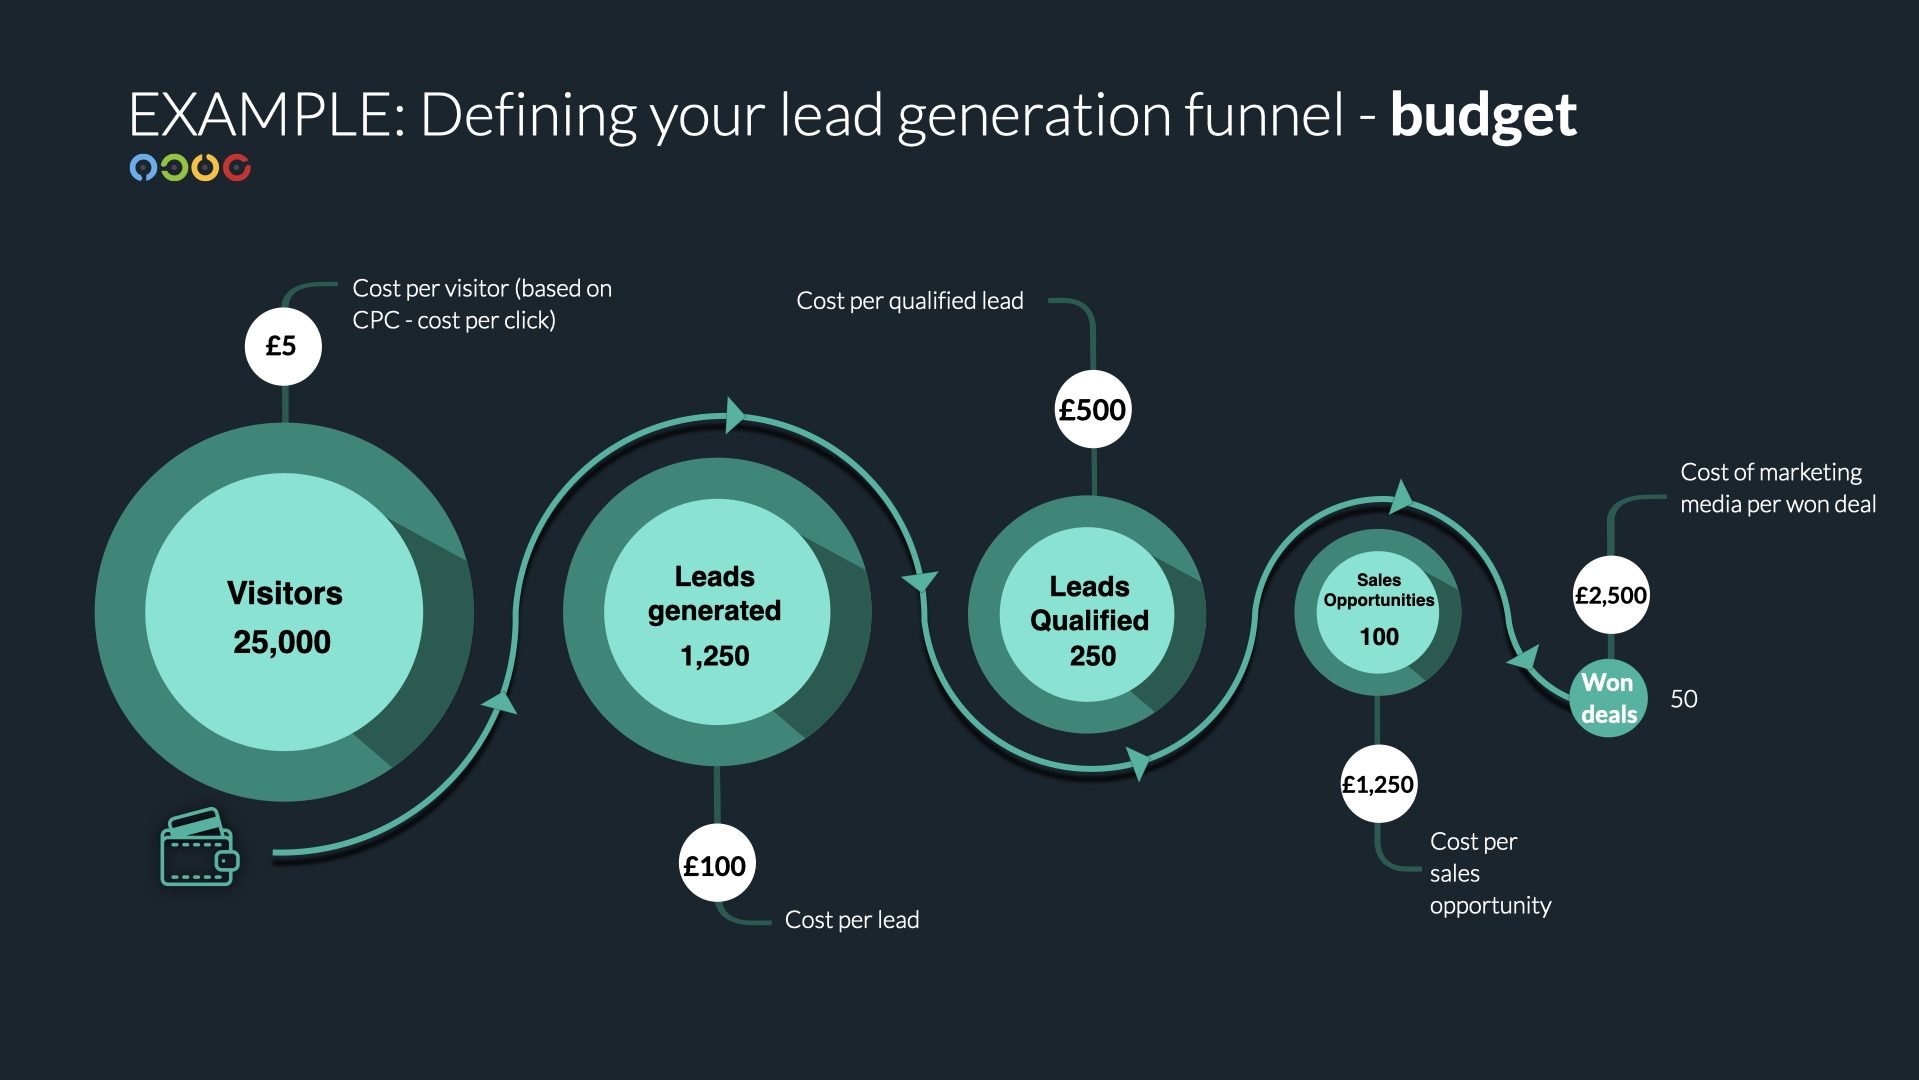 lead generation budget